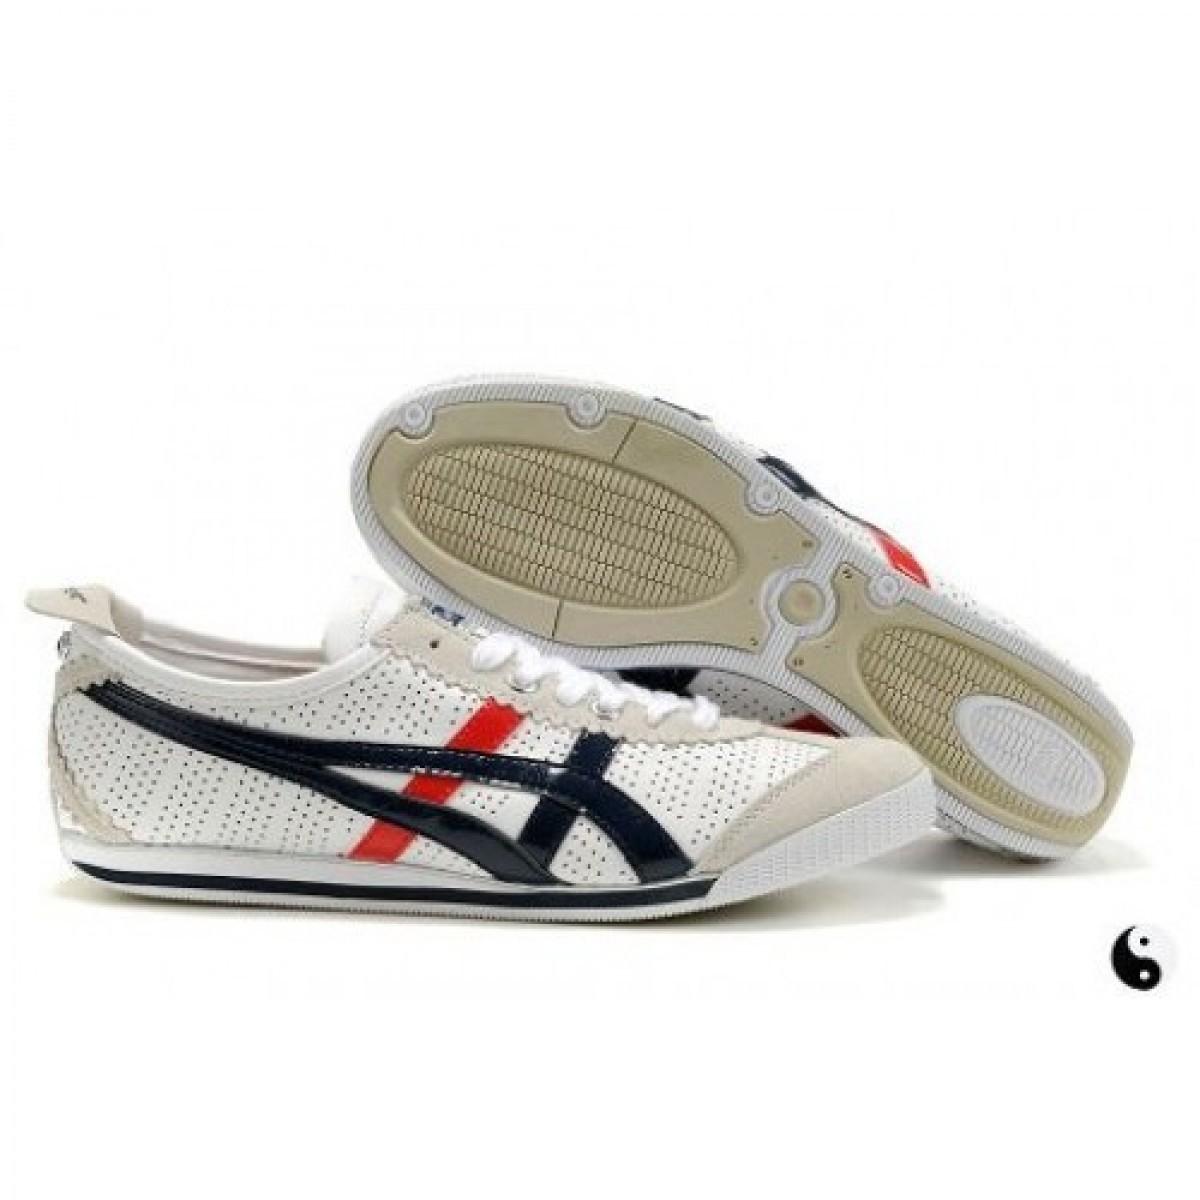 chaussures asics femme en soldes